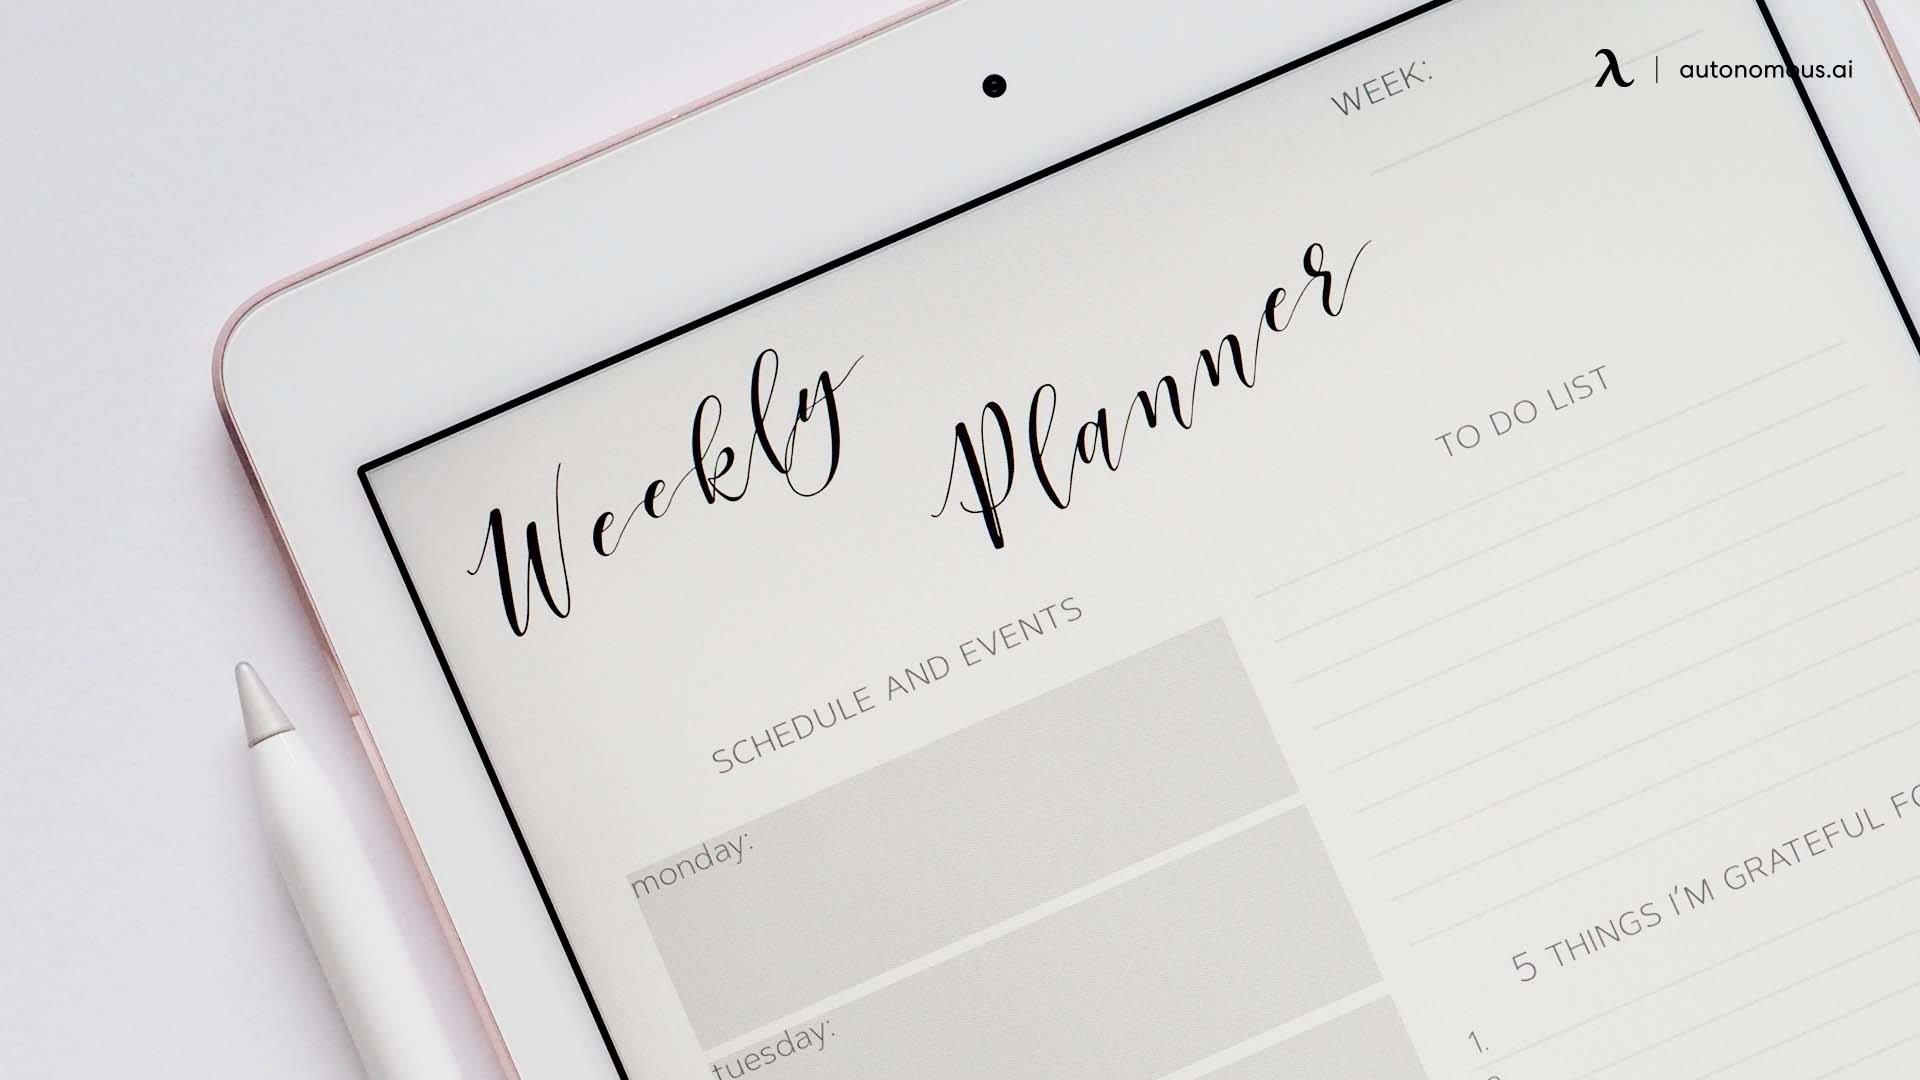 Plan your tasks